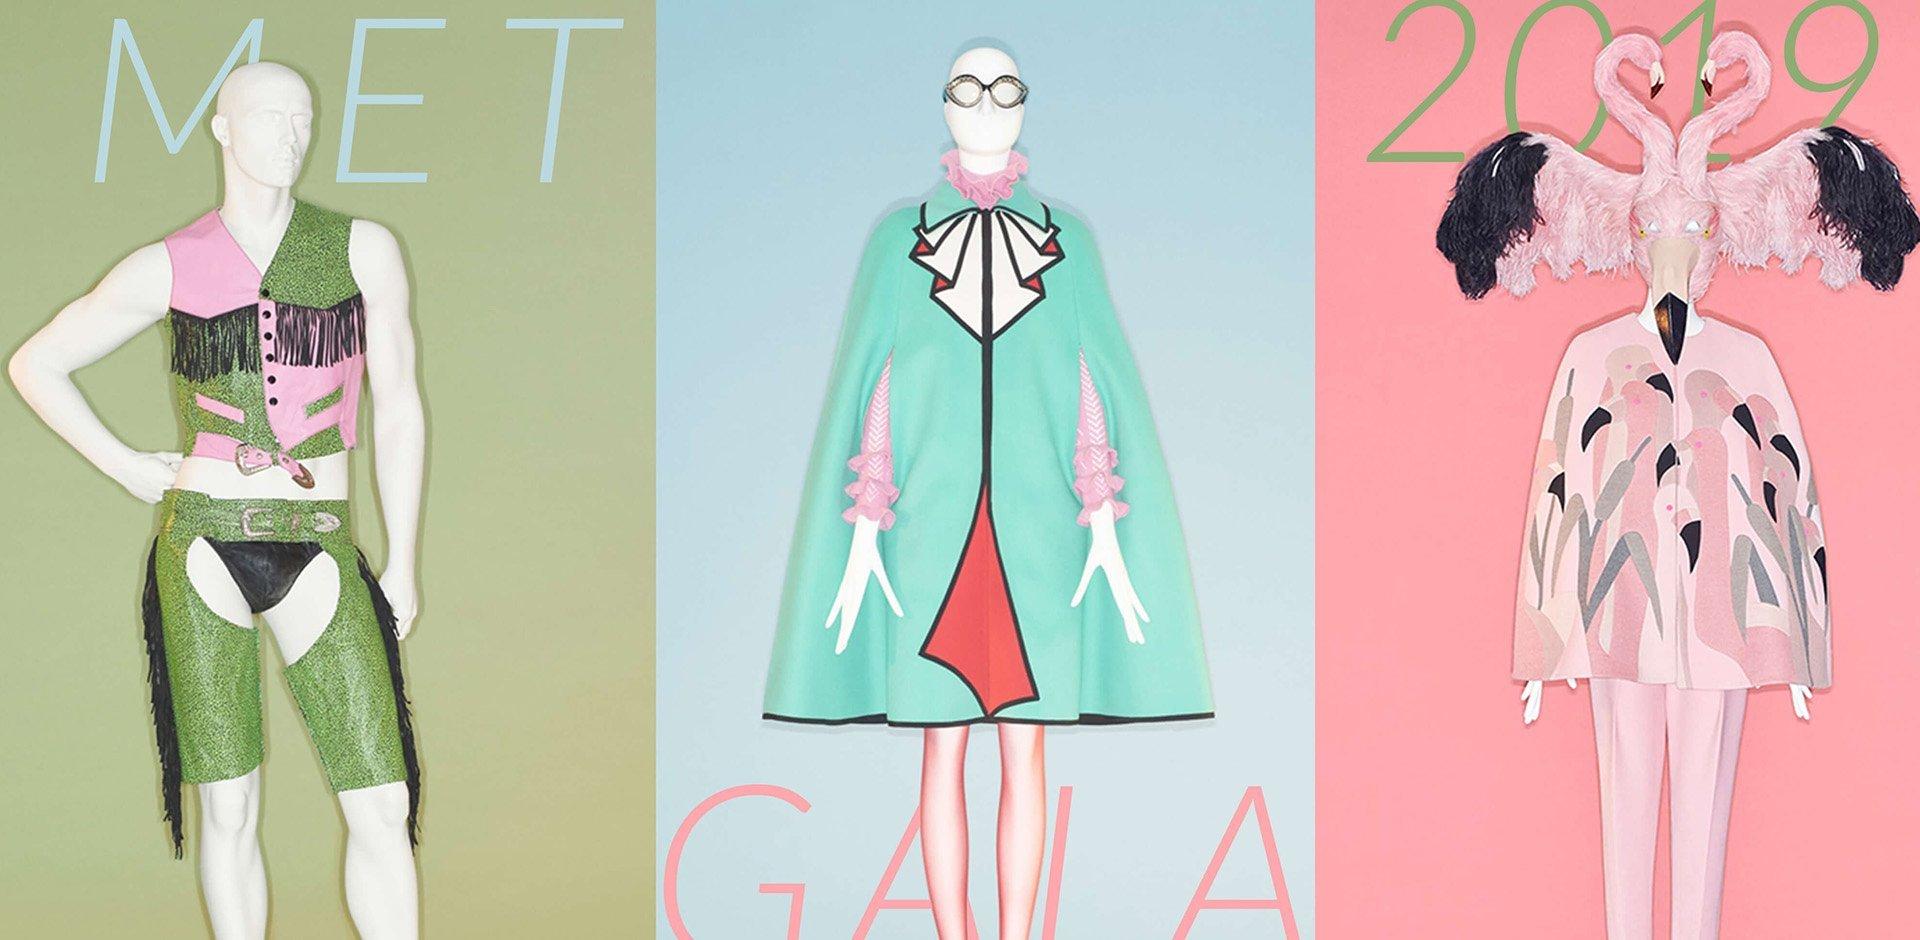 Mostra Met Gala 2019, camp